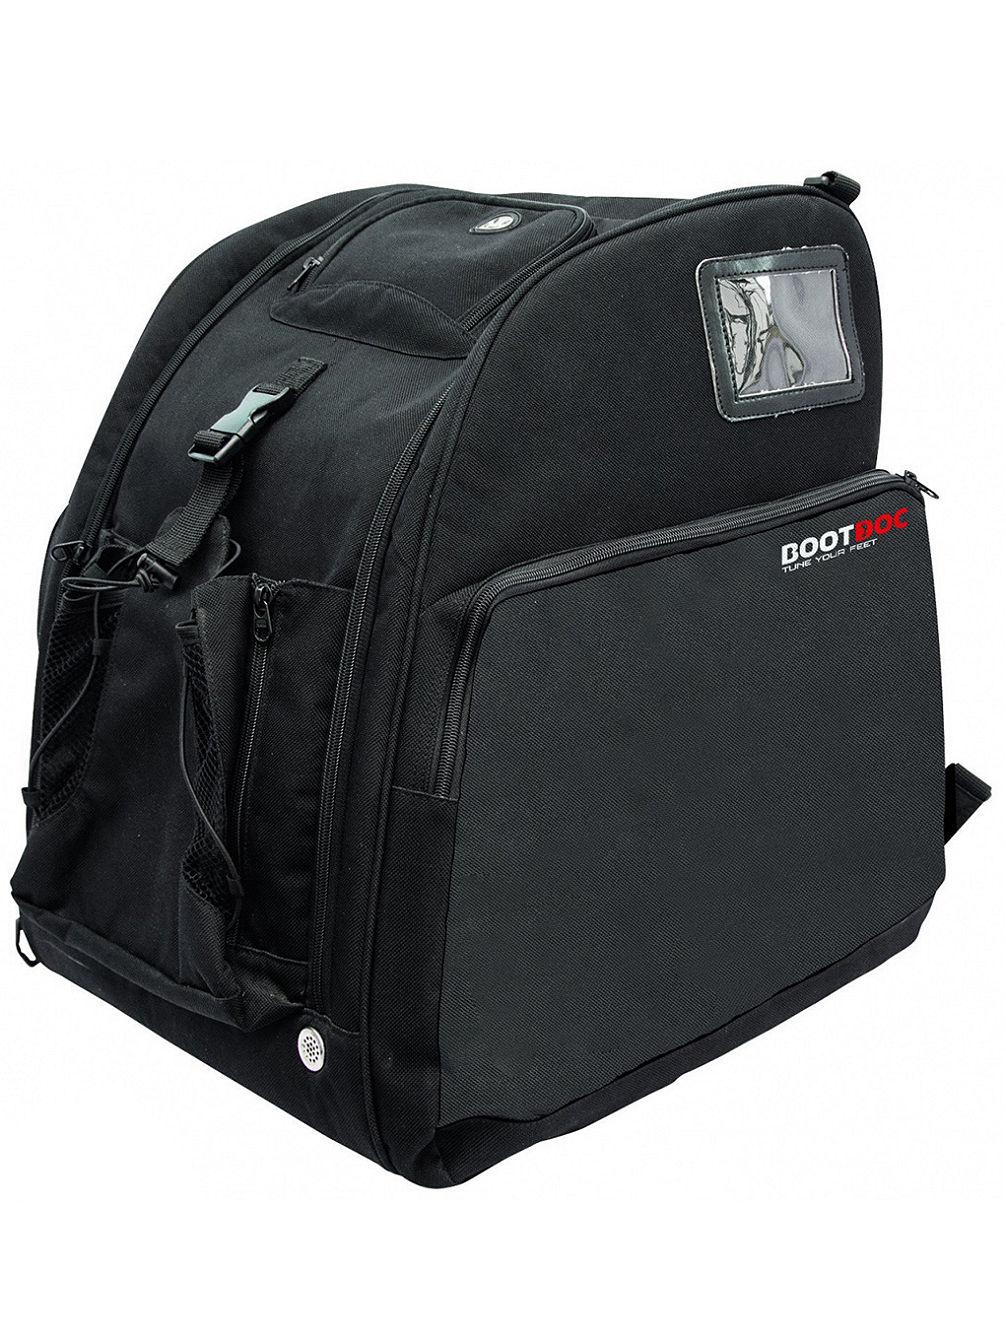 f17685d2f2 Buy Bootdoc BD Heated Ski Boot Racing Bag online at blue-tomato.com